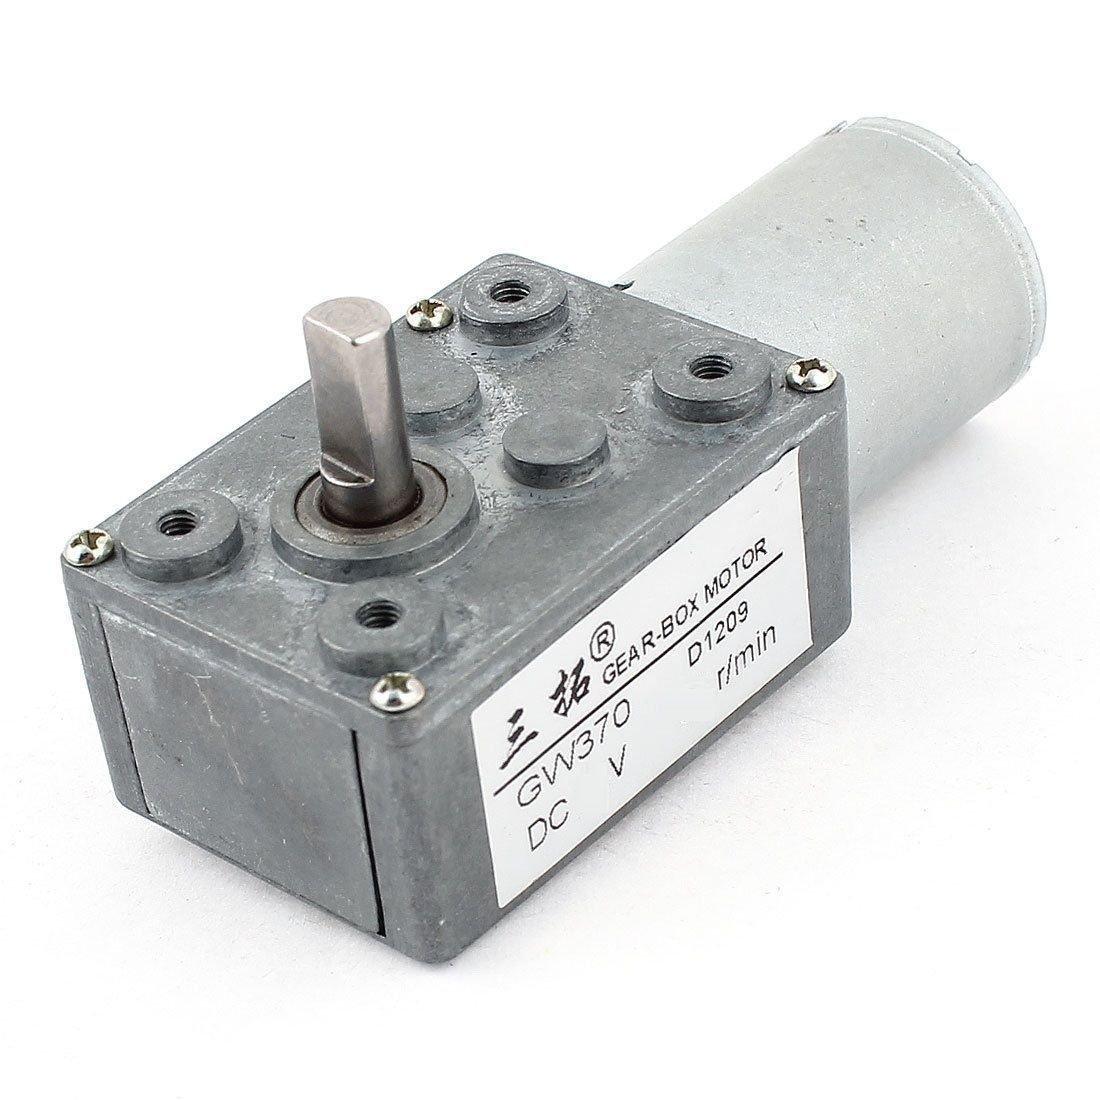 12V 45RPM 2.5kg.cm 0.3A Low Speed High-torque Reducer Gearbox DC Worm Gear Motor